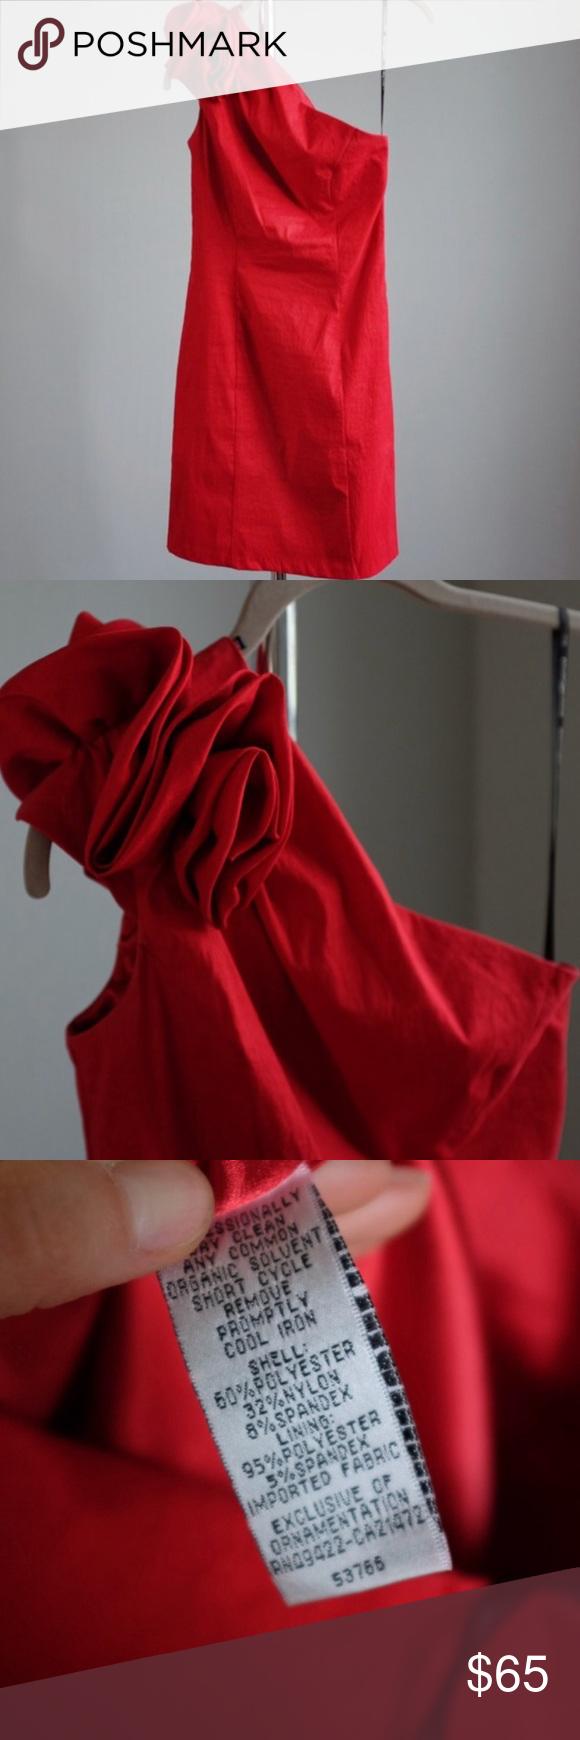 Jessica mcclintock red dress perfect valentine en my posh